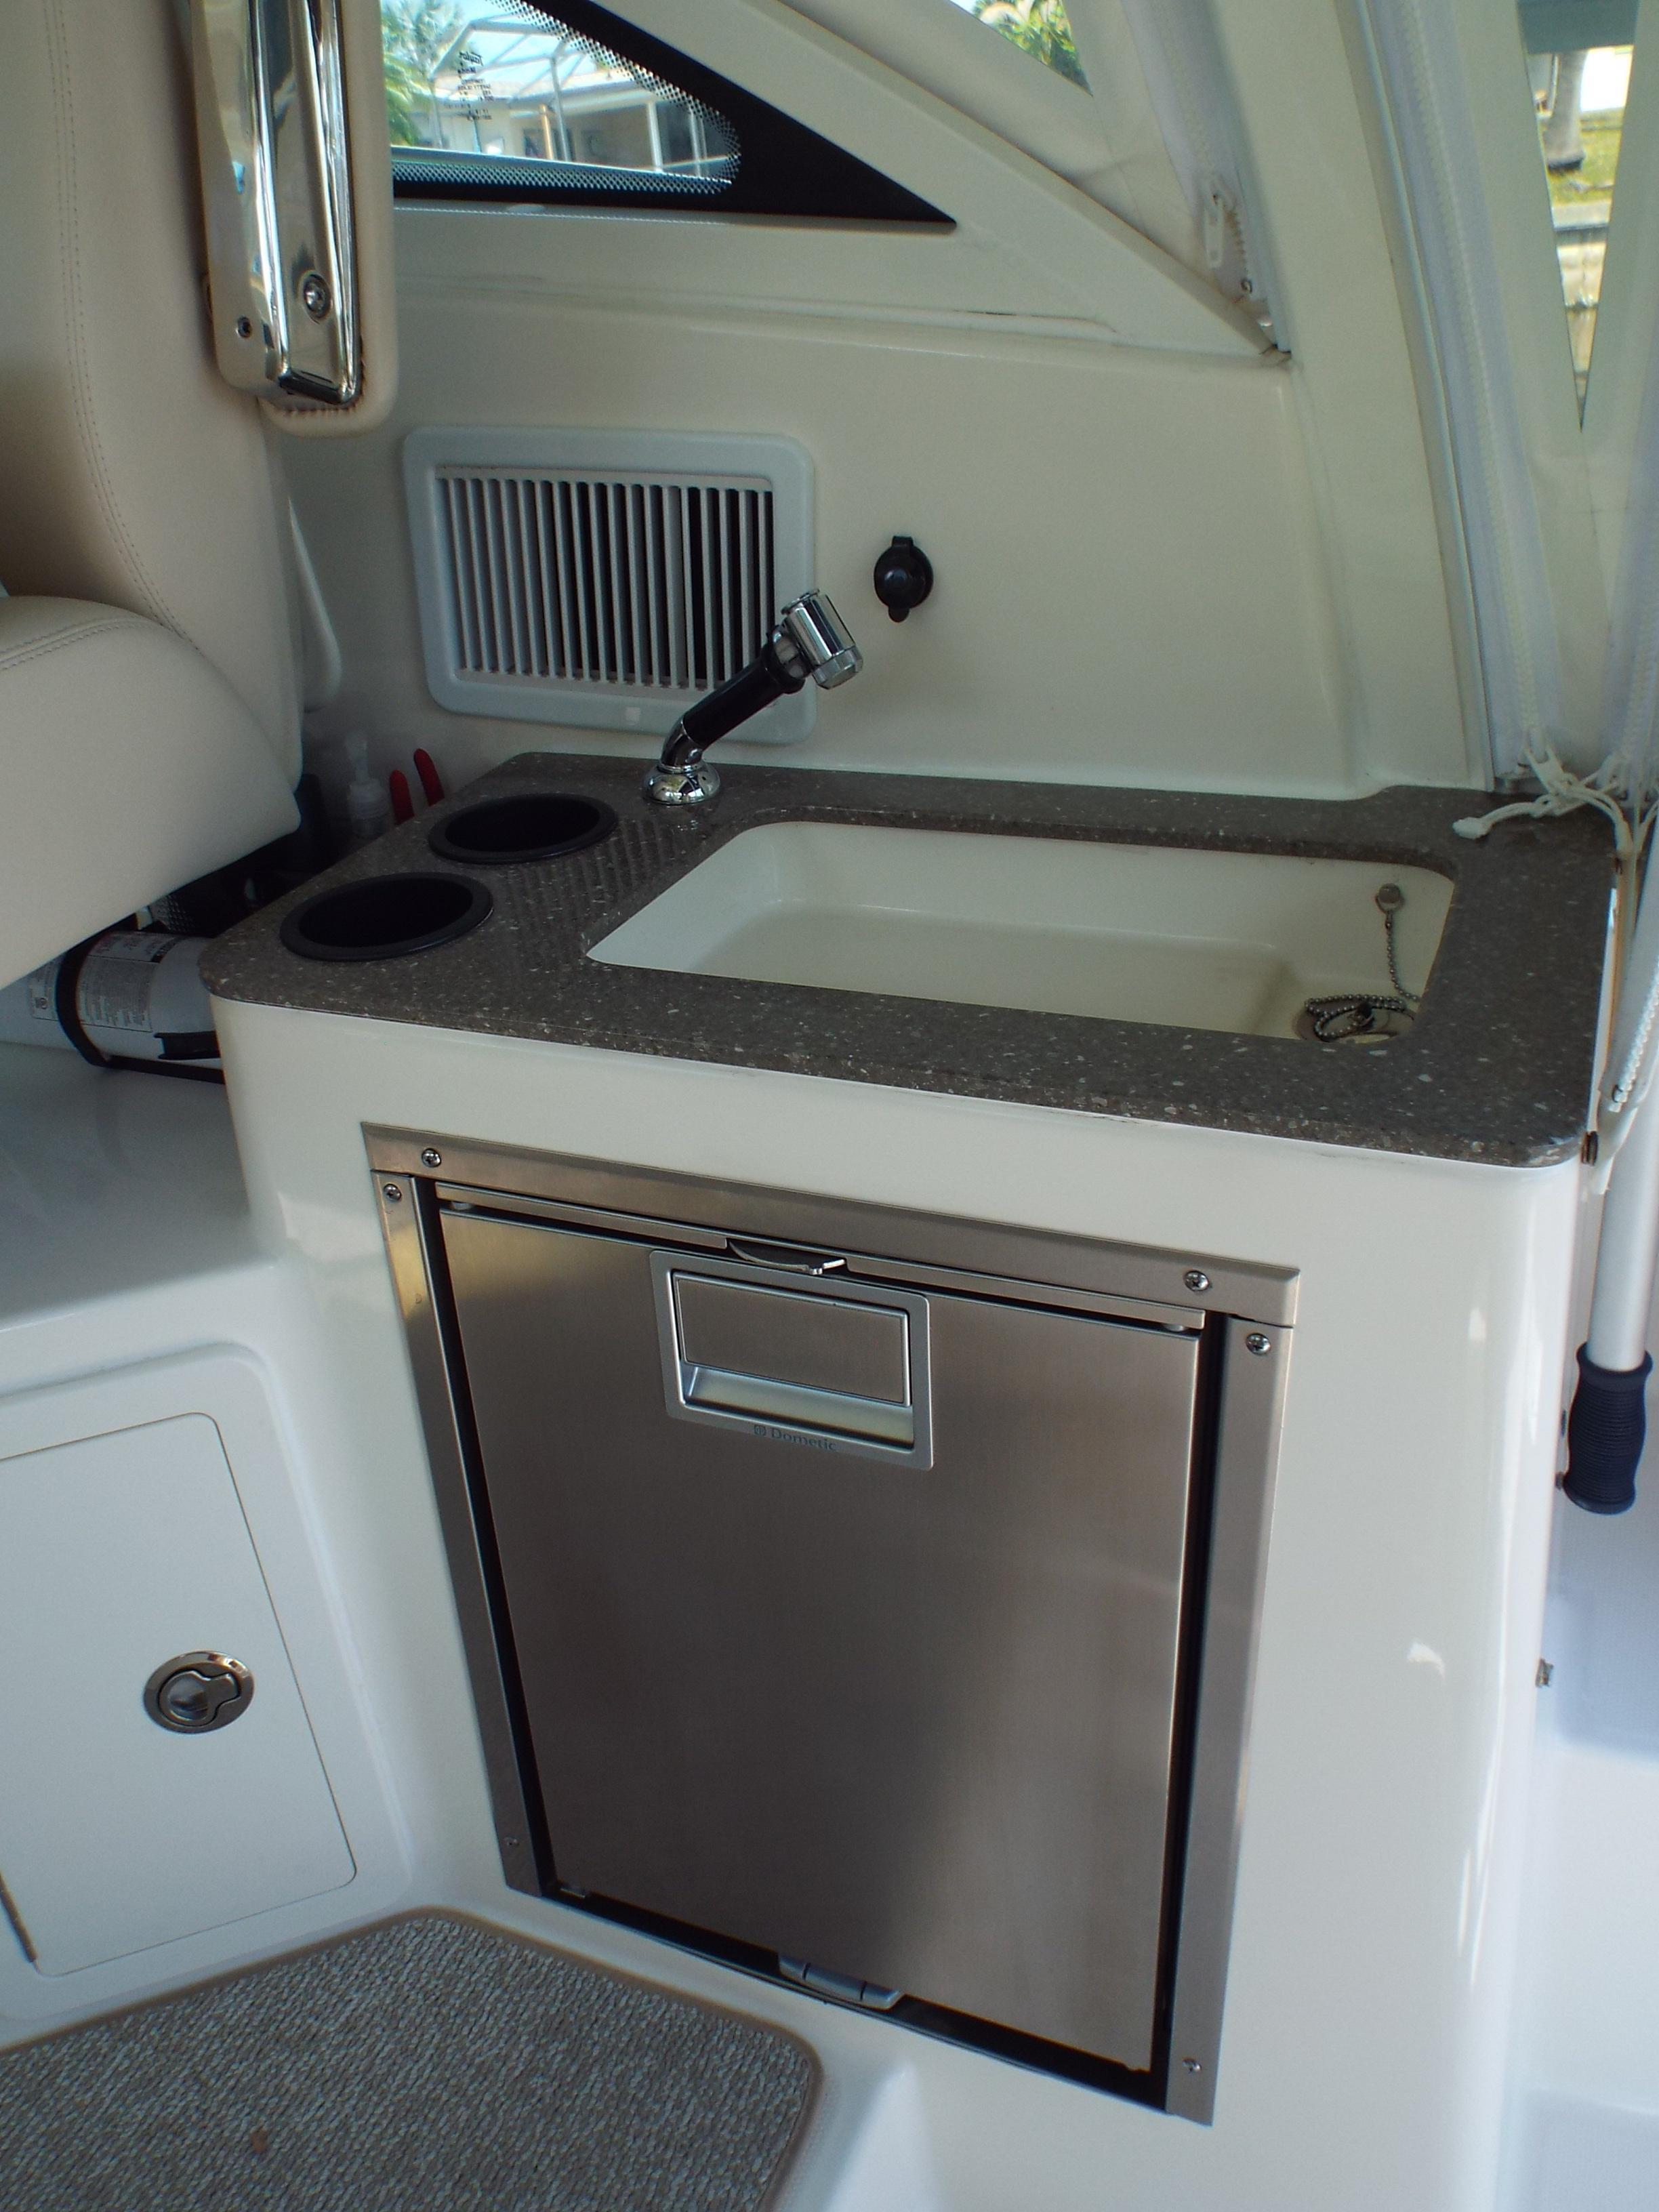 Cockpit Wet Bar and Refrigerator